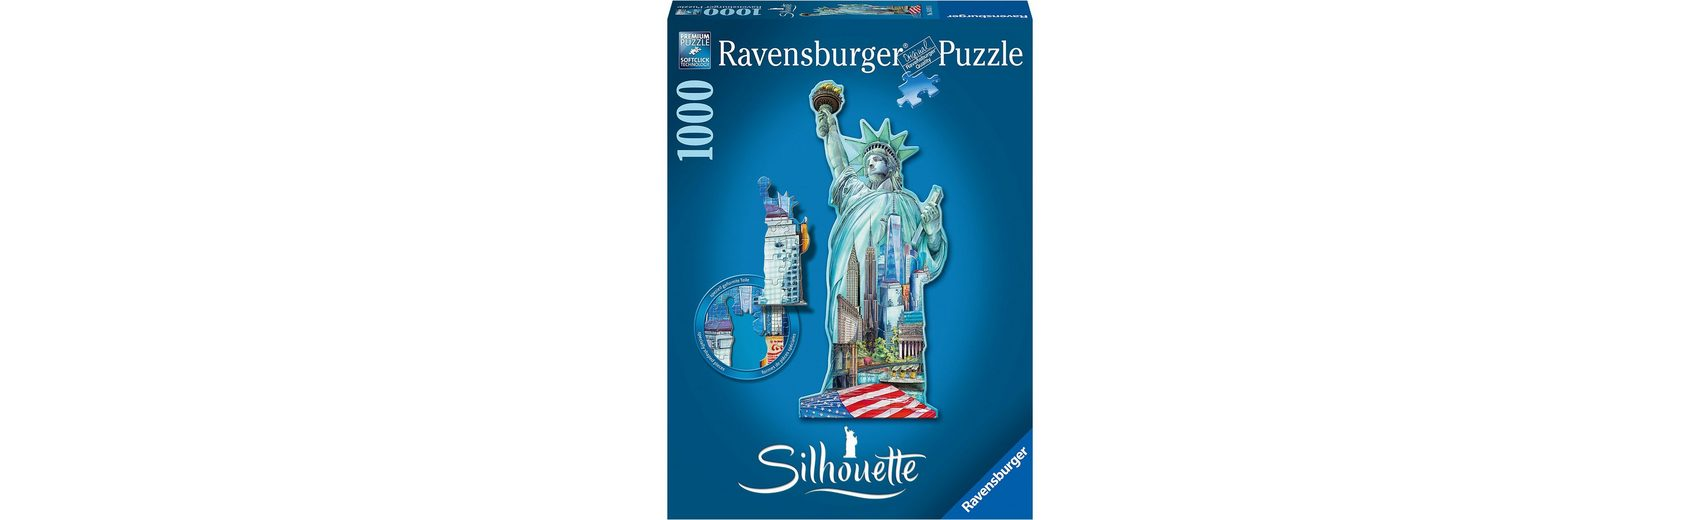 Ravensburger Puzzle Freiheitsstatue Silhouette Puzzles 1000 Teile